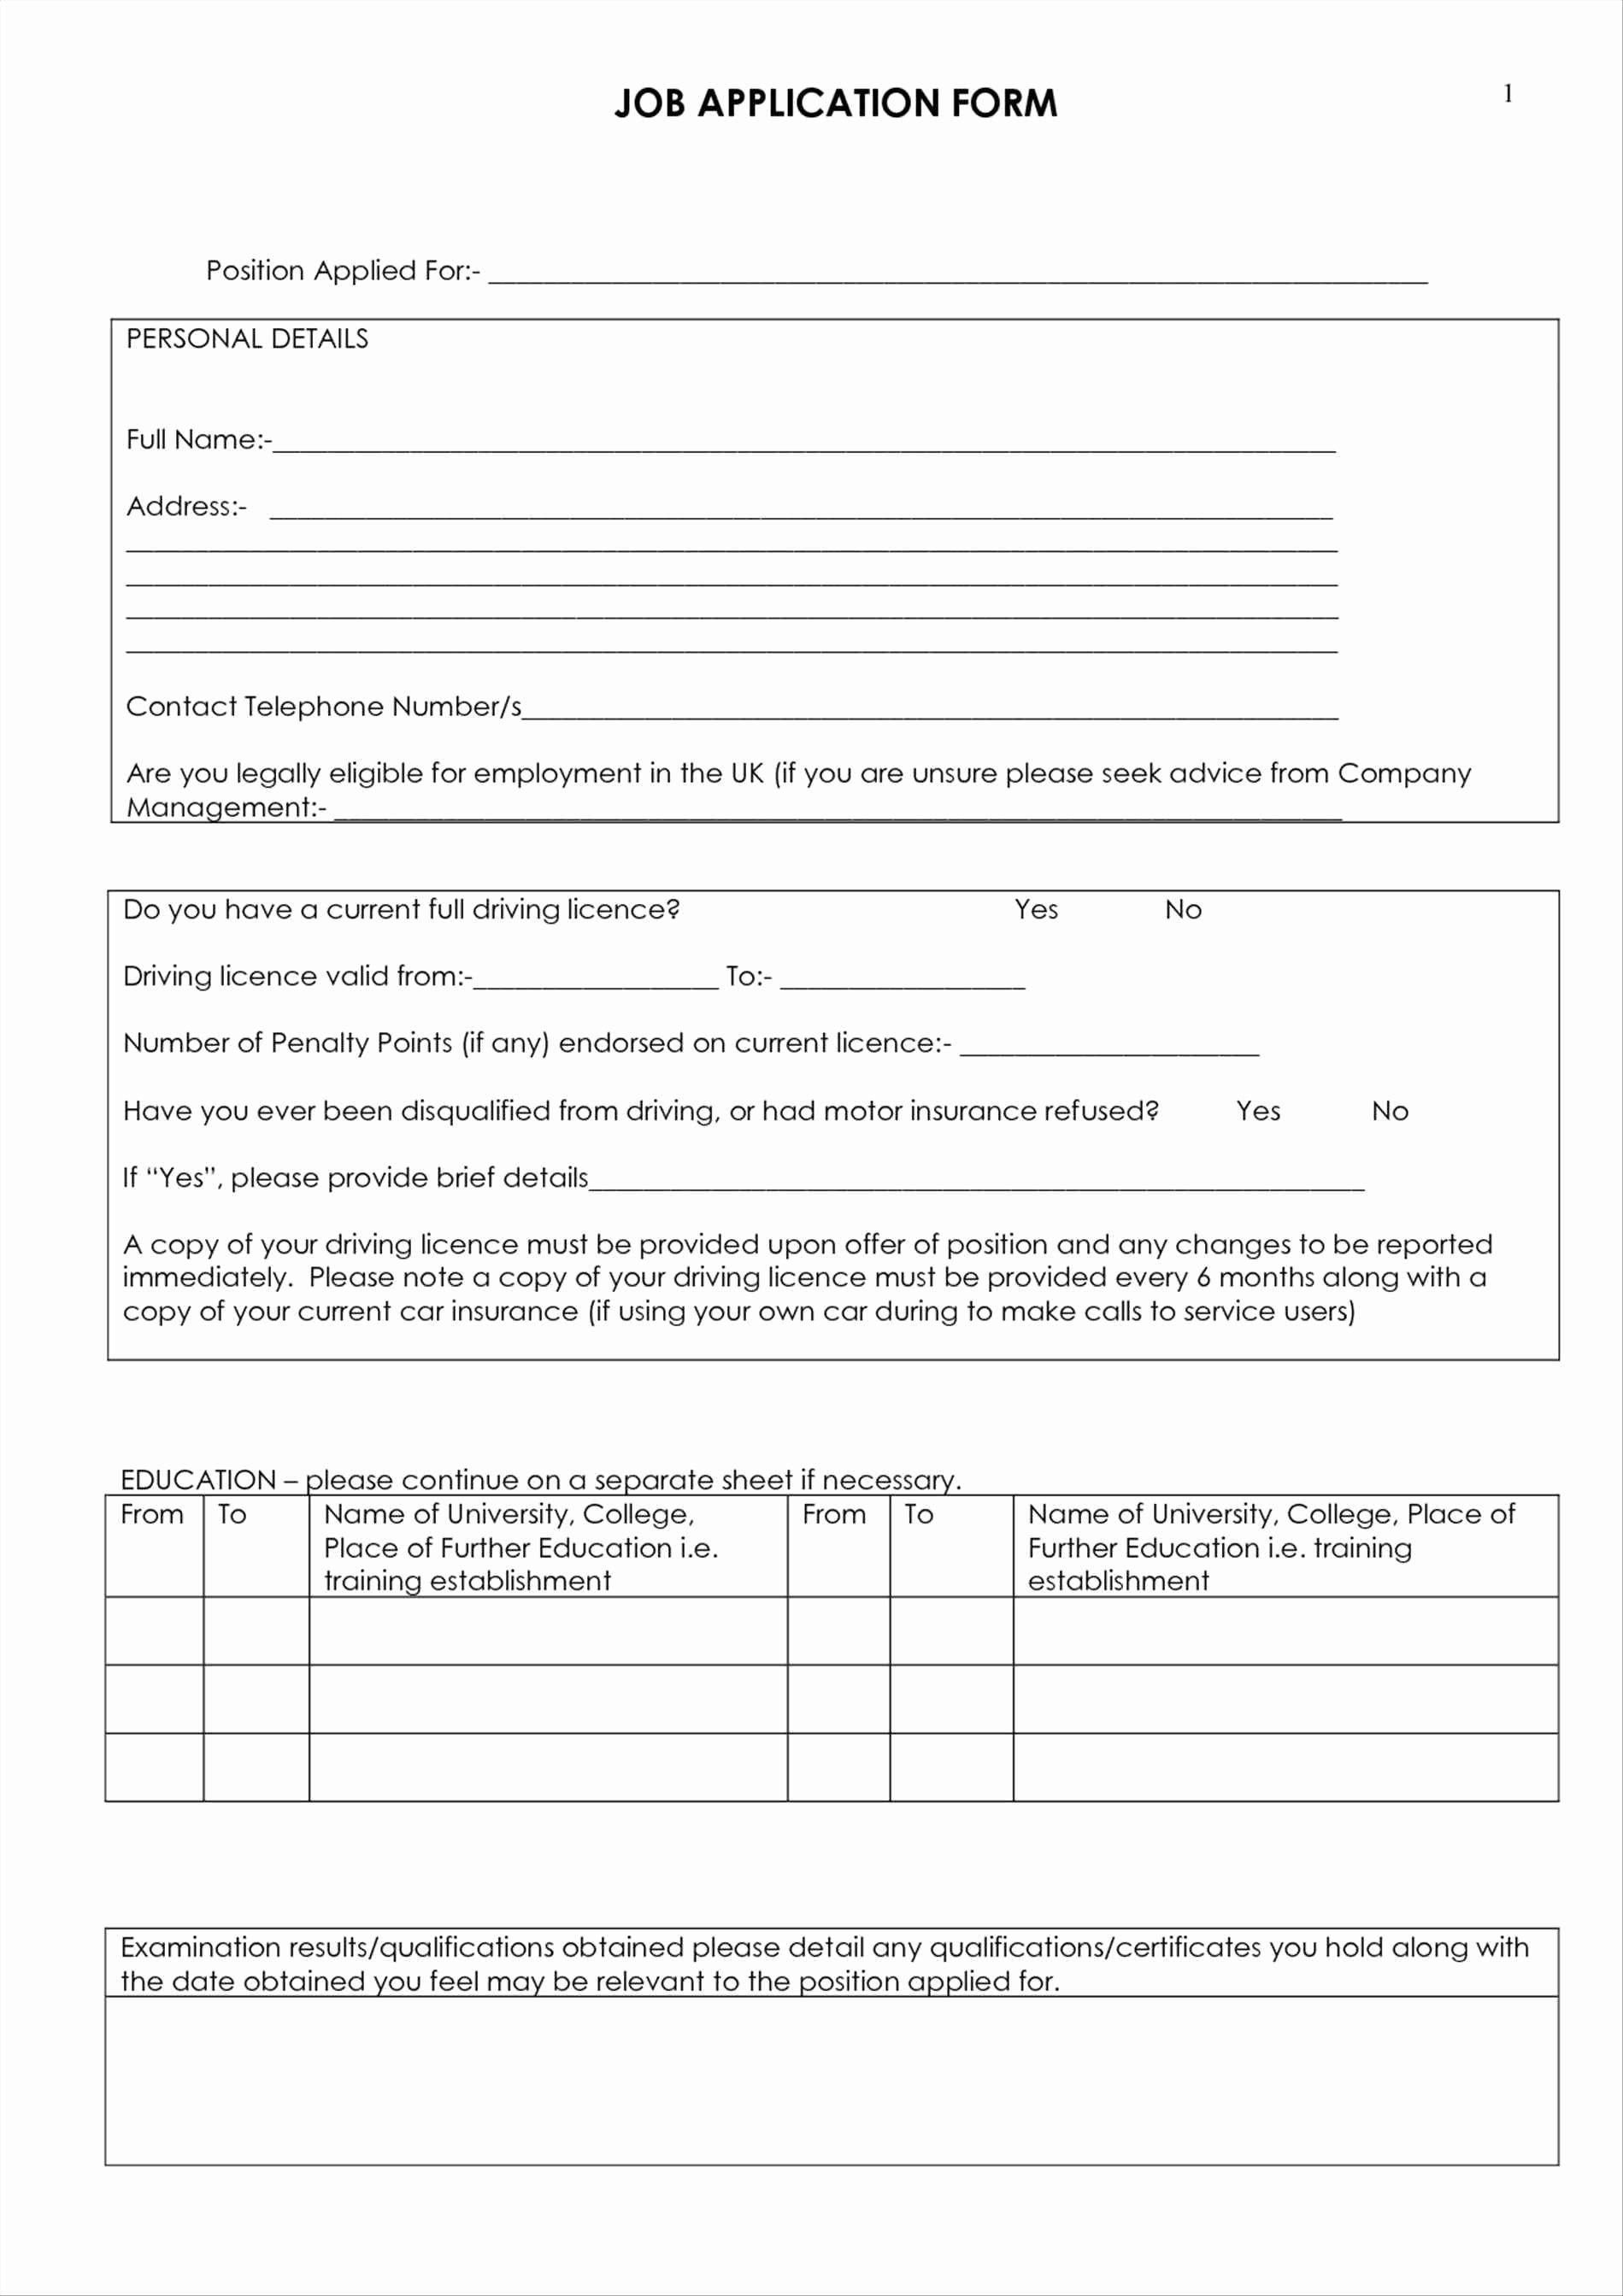 How To Do A Job Application Form